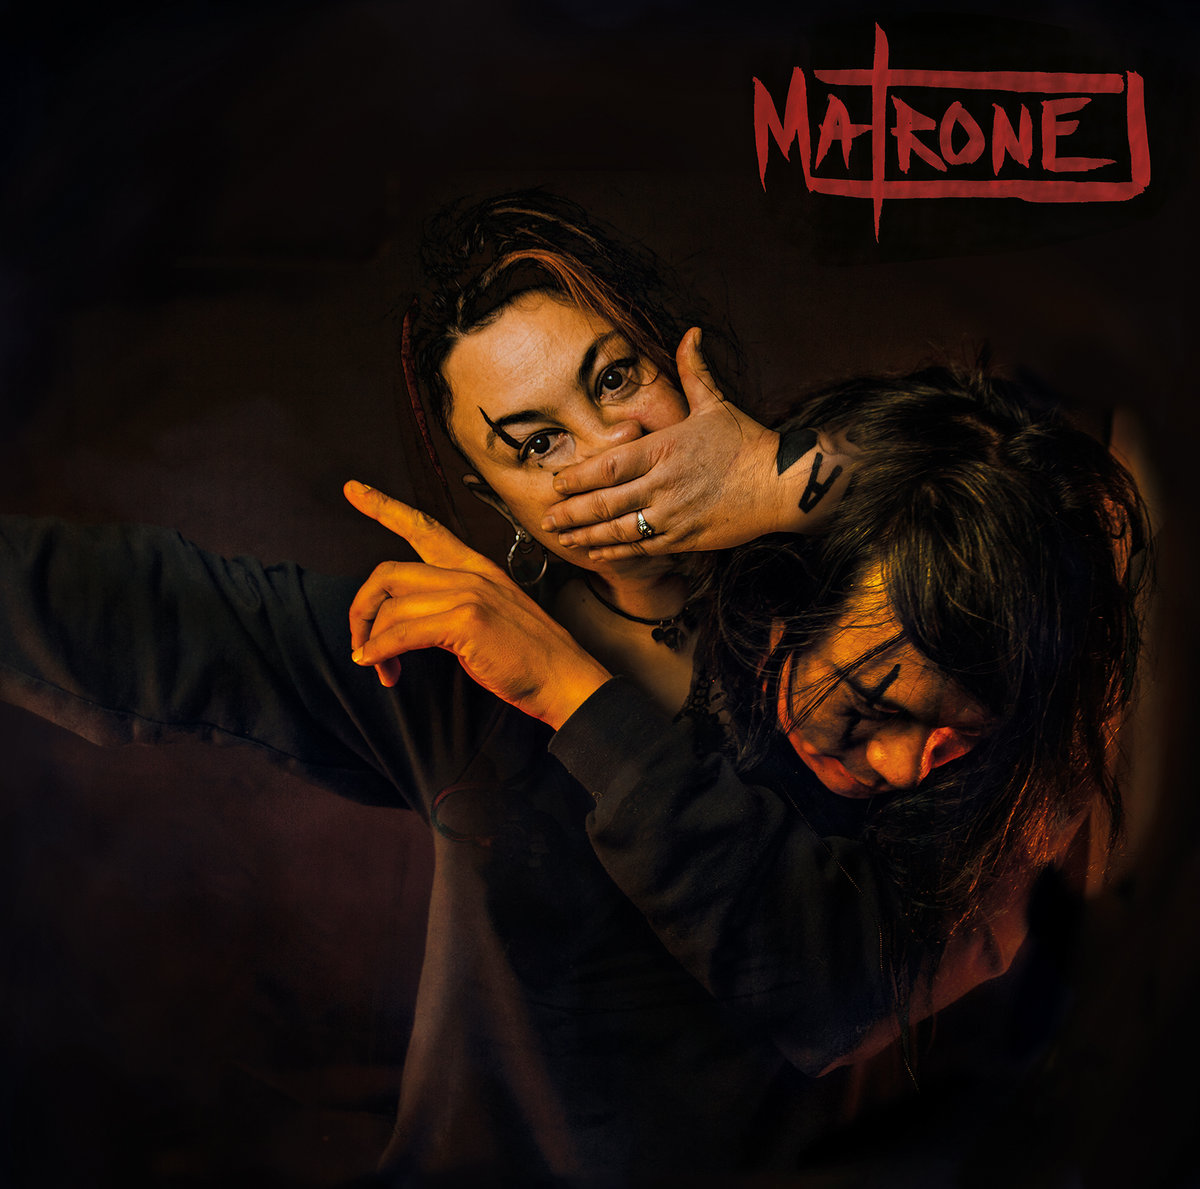 Matrone - st